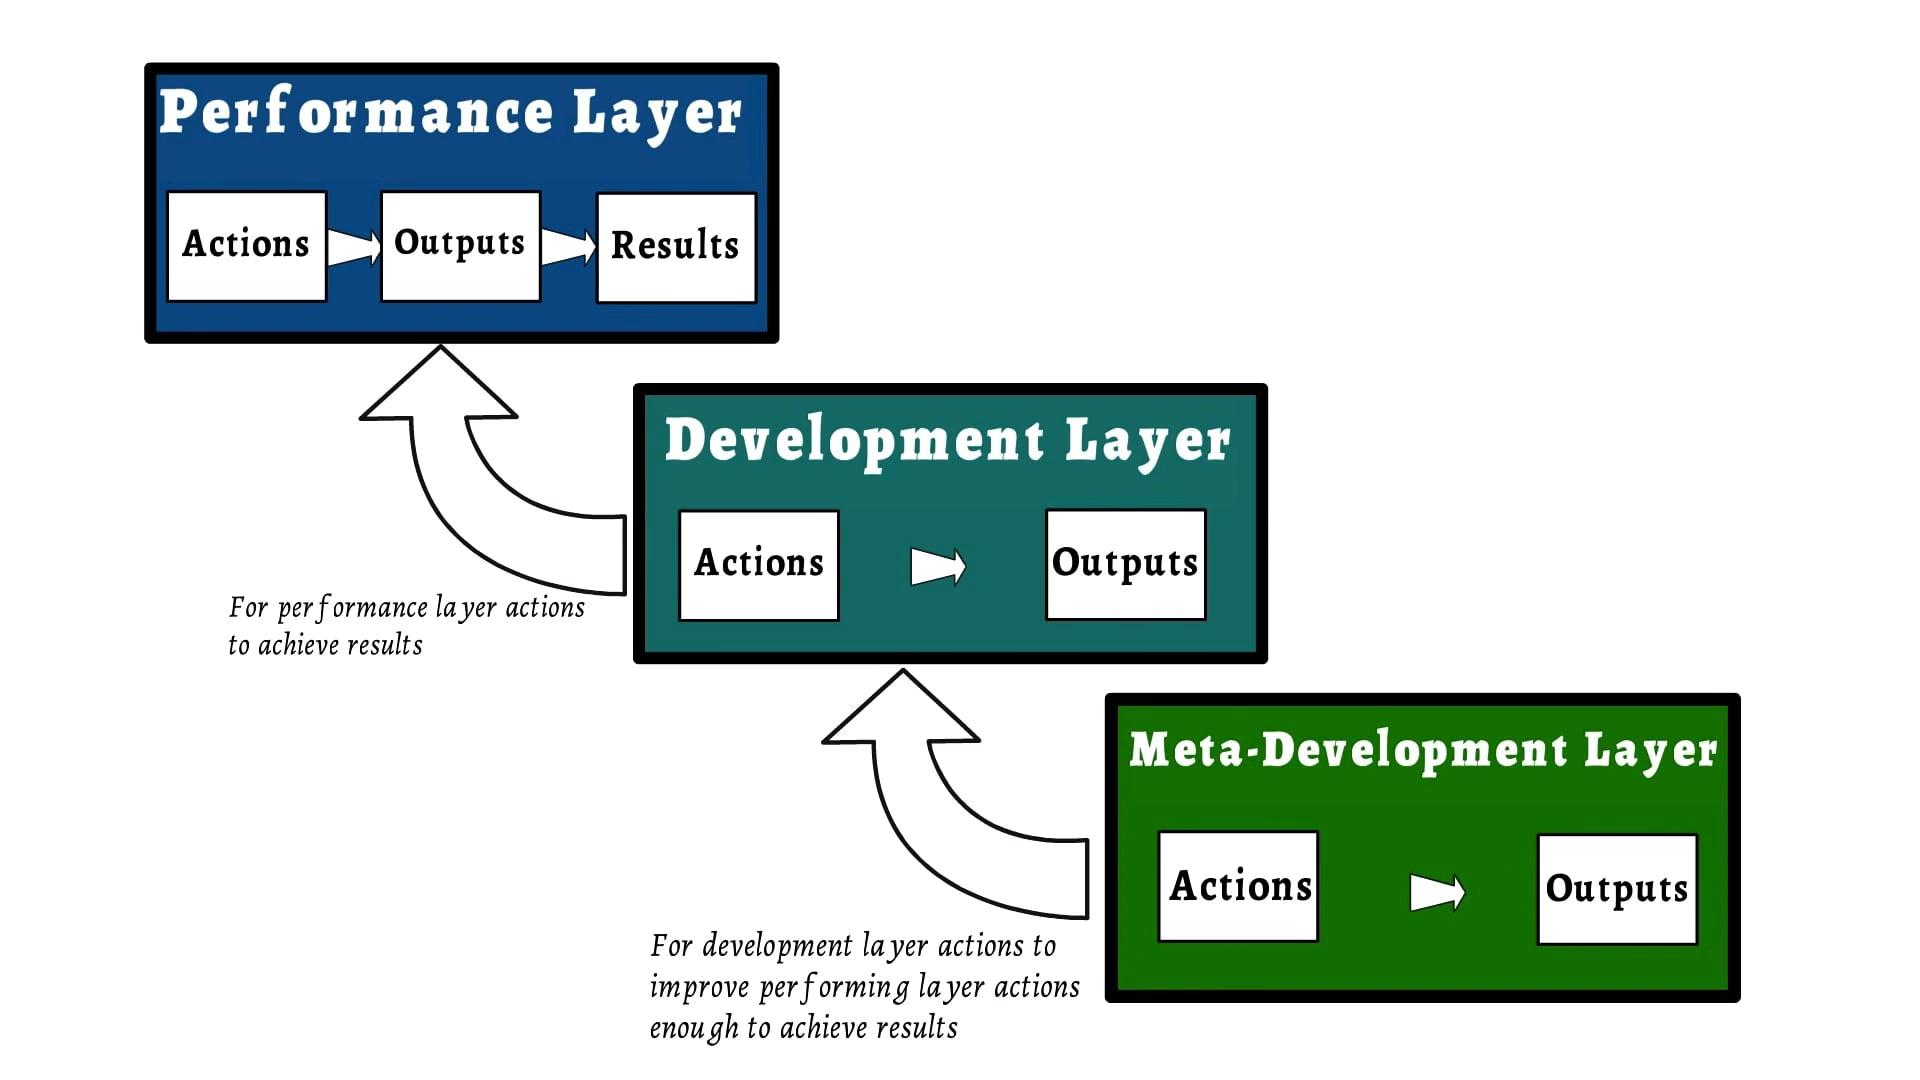 What problem does the Development Optimiser Solve